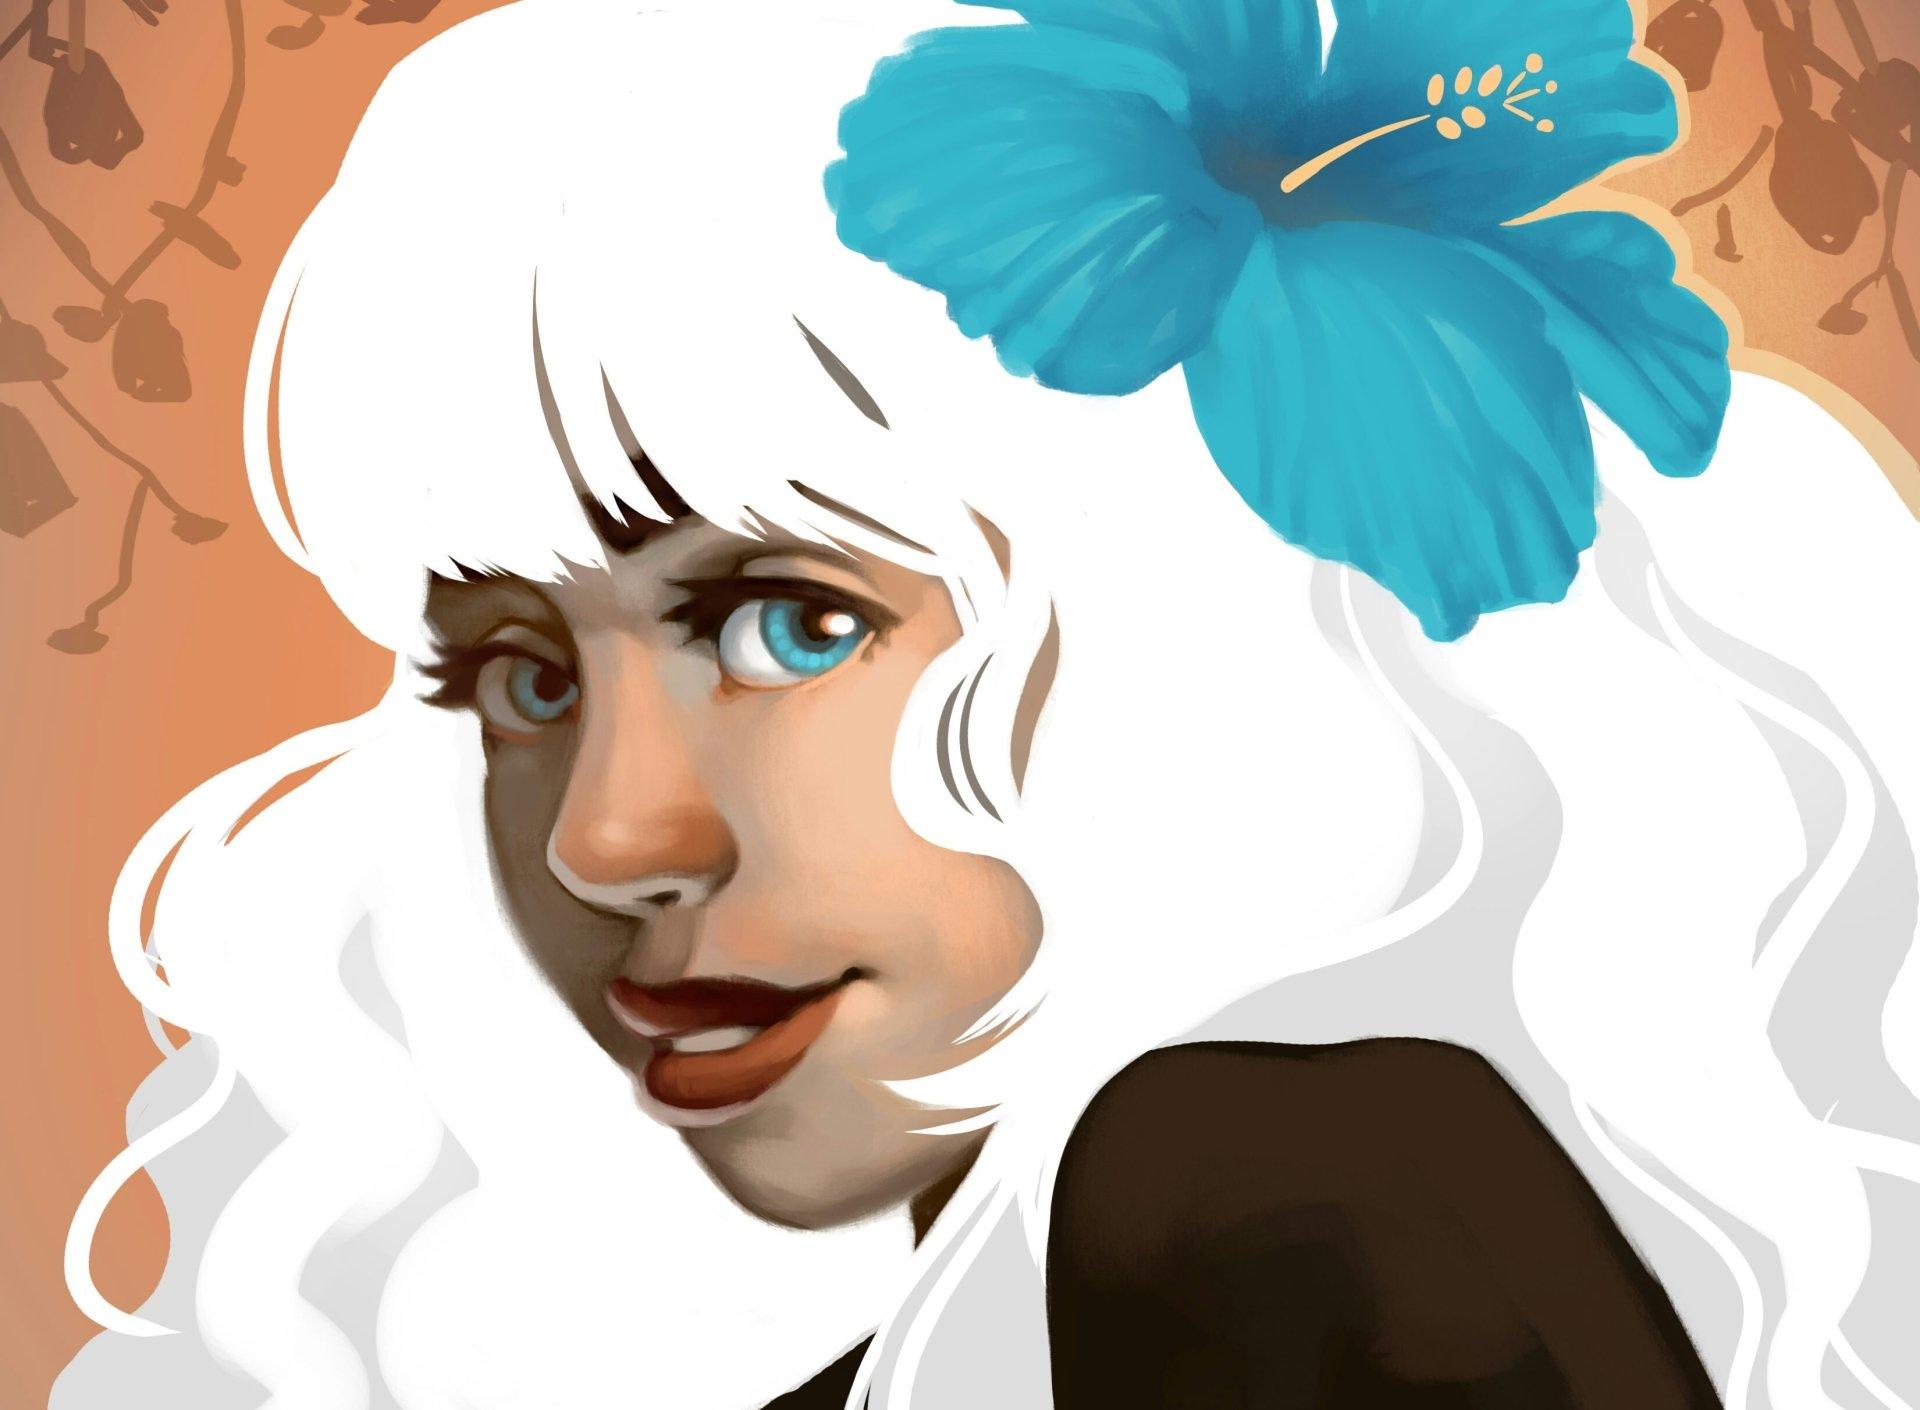 Artistic - Women  Blue Eyes White Hair Face Girl Woman Wallpaper